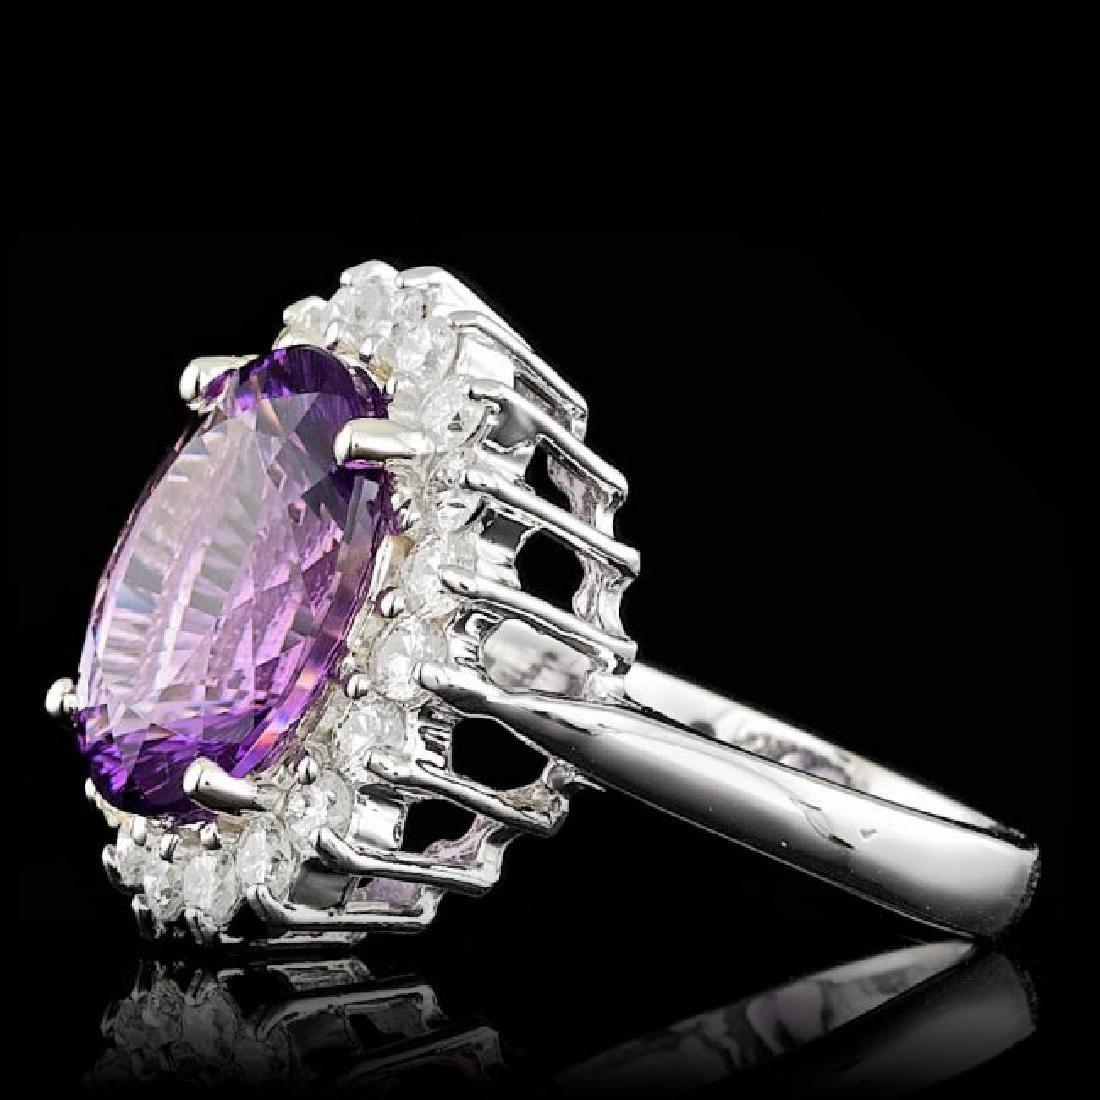 14k Gold 5.00ct Amethyst 1.00ct Diamond Ring - 2